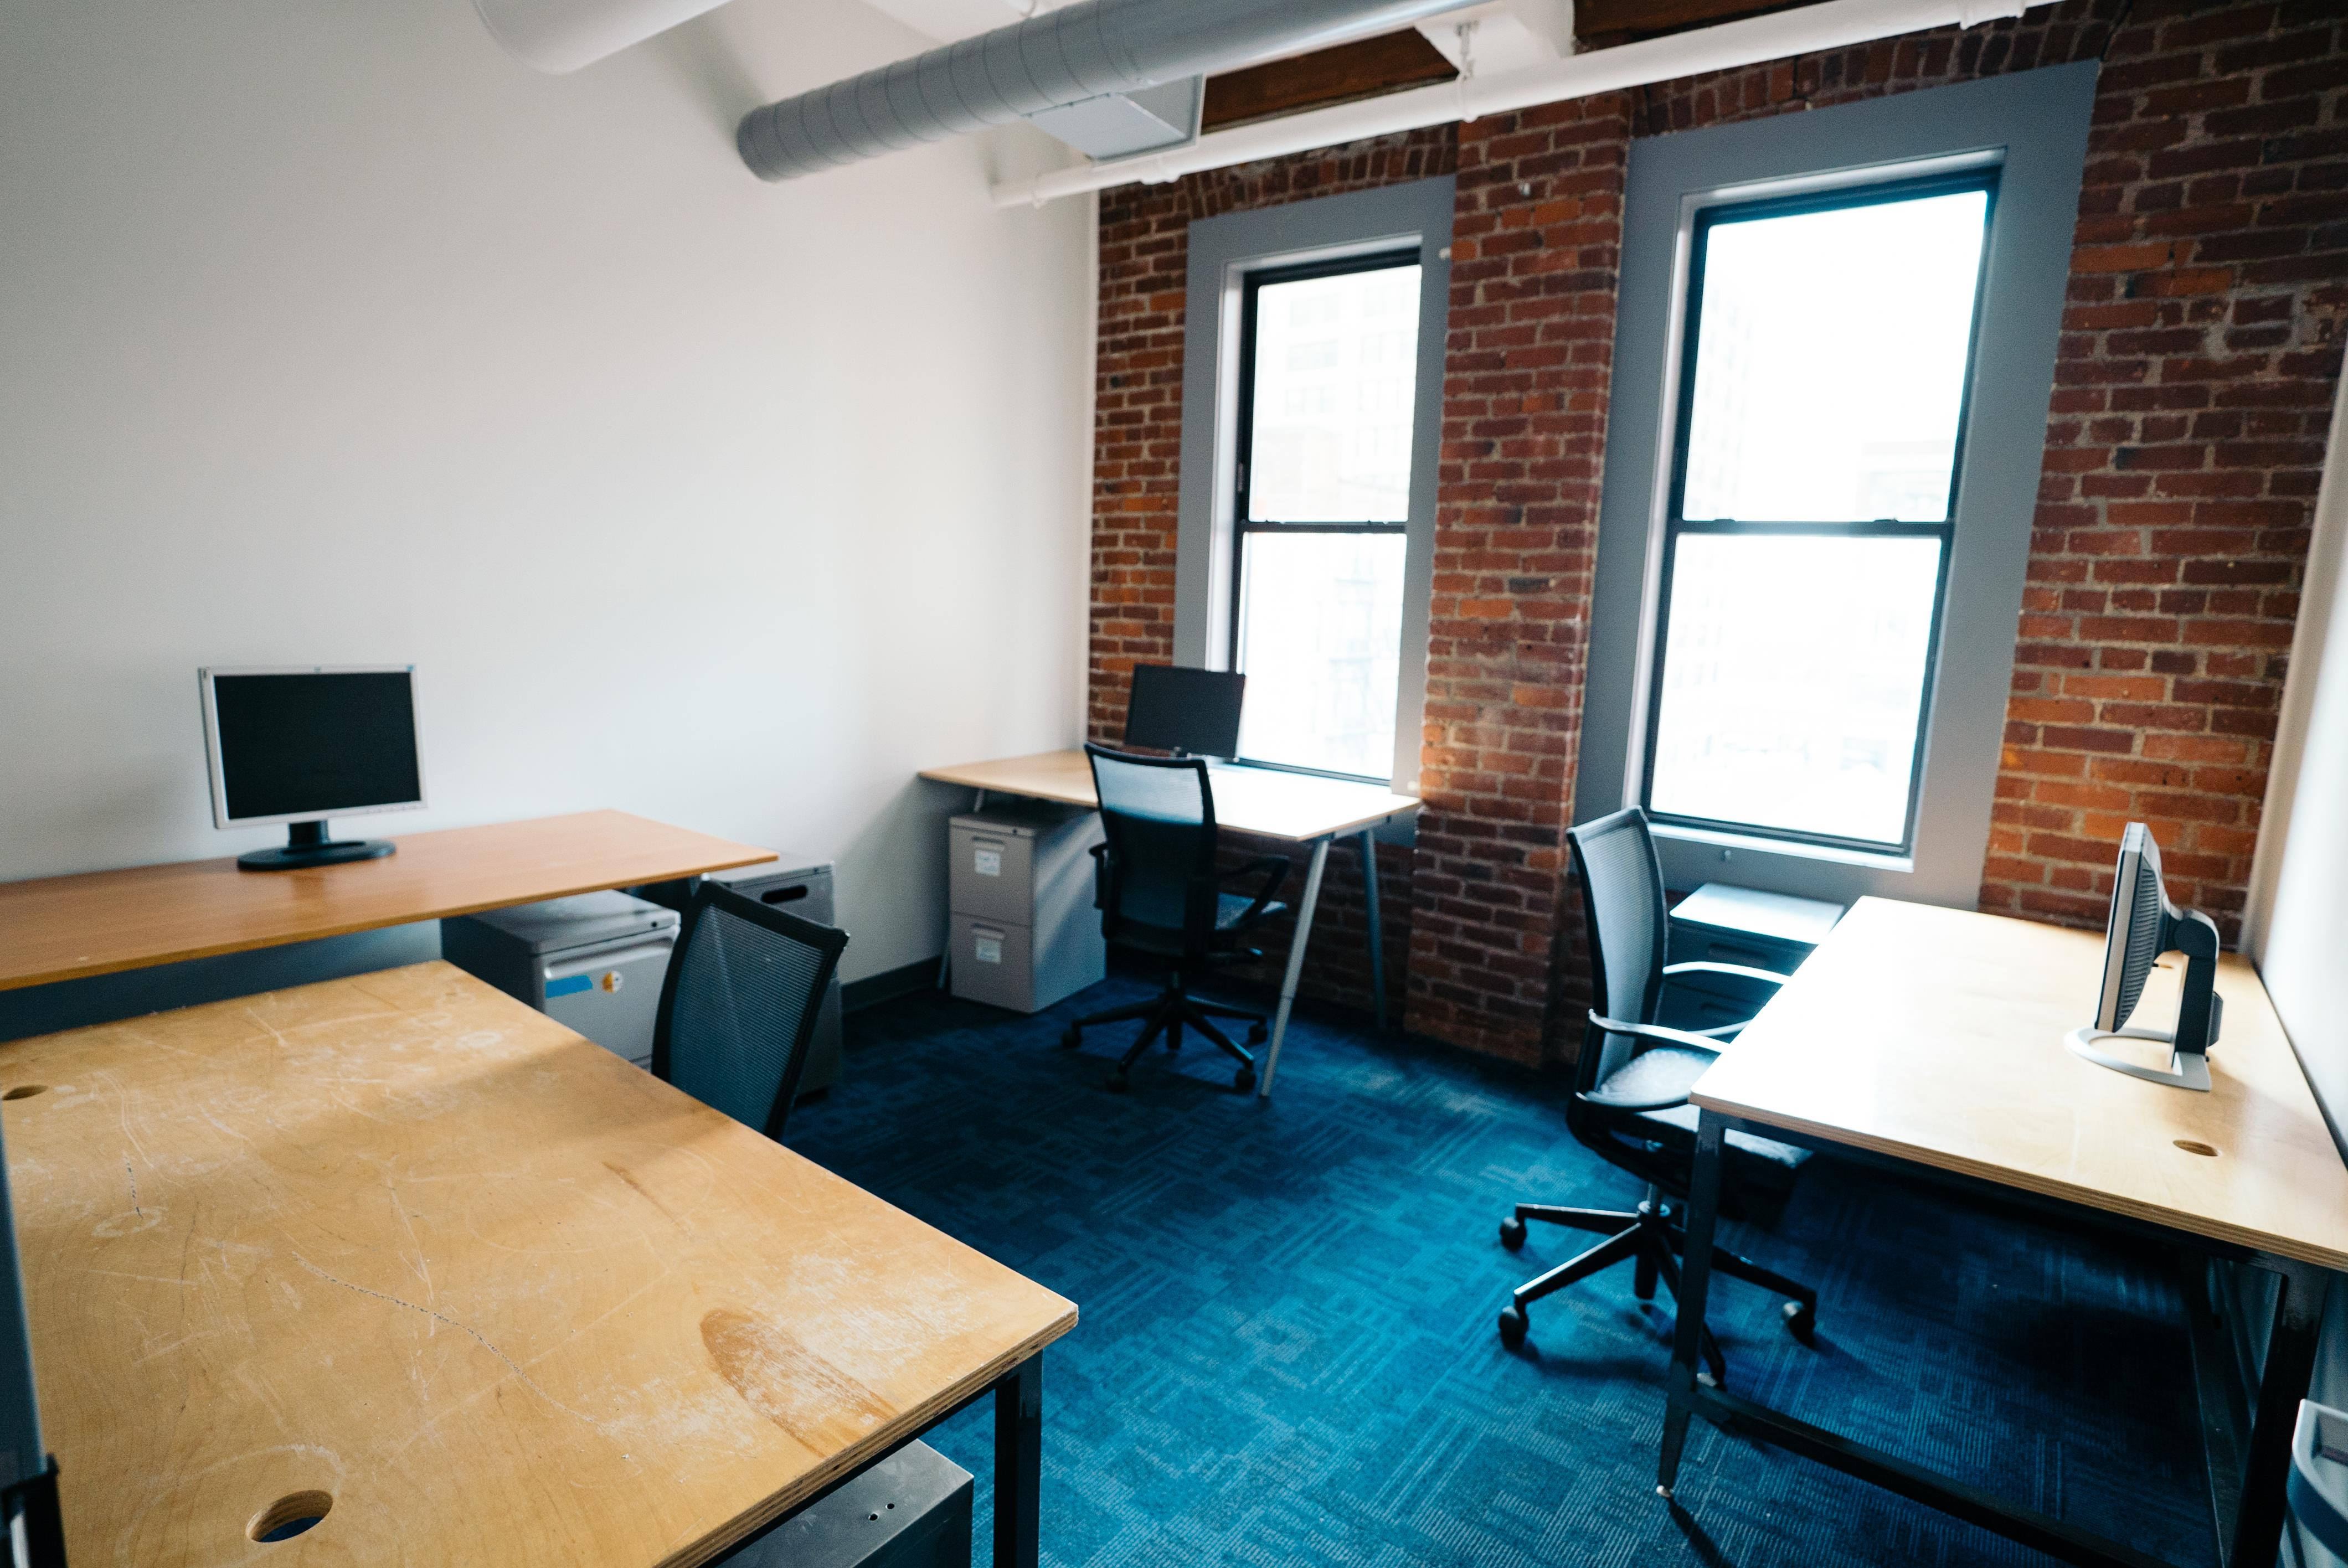 Coalition: Boston - Private Office for 4